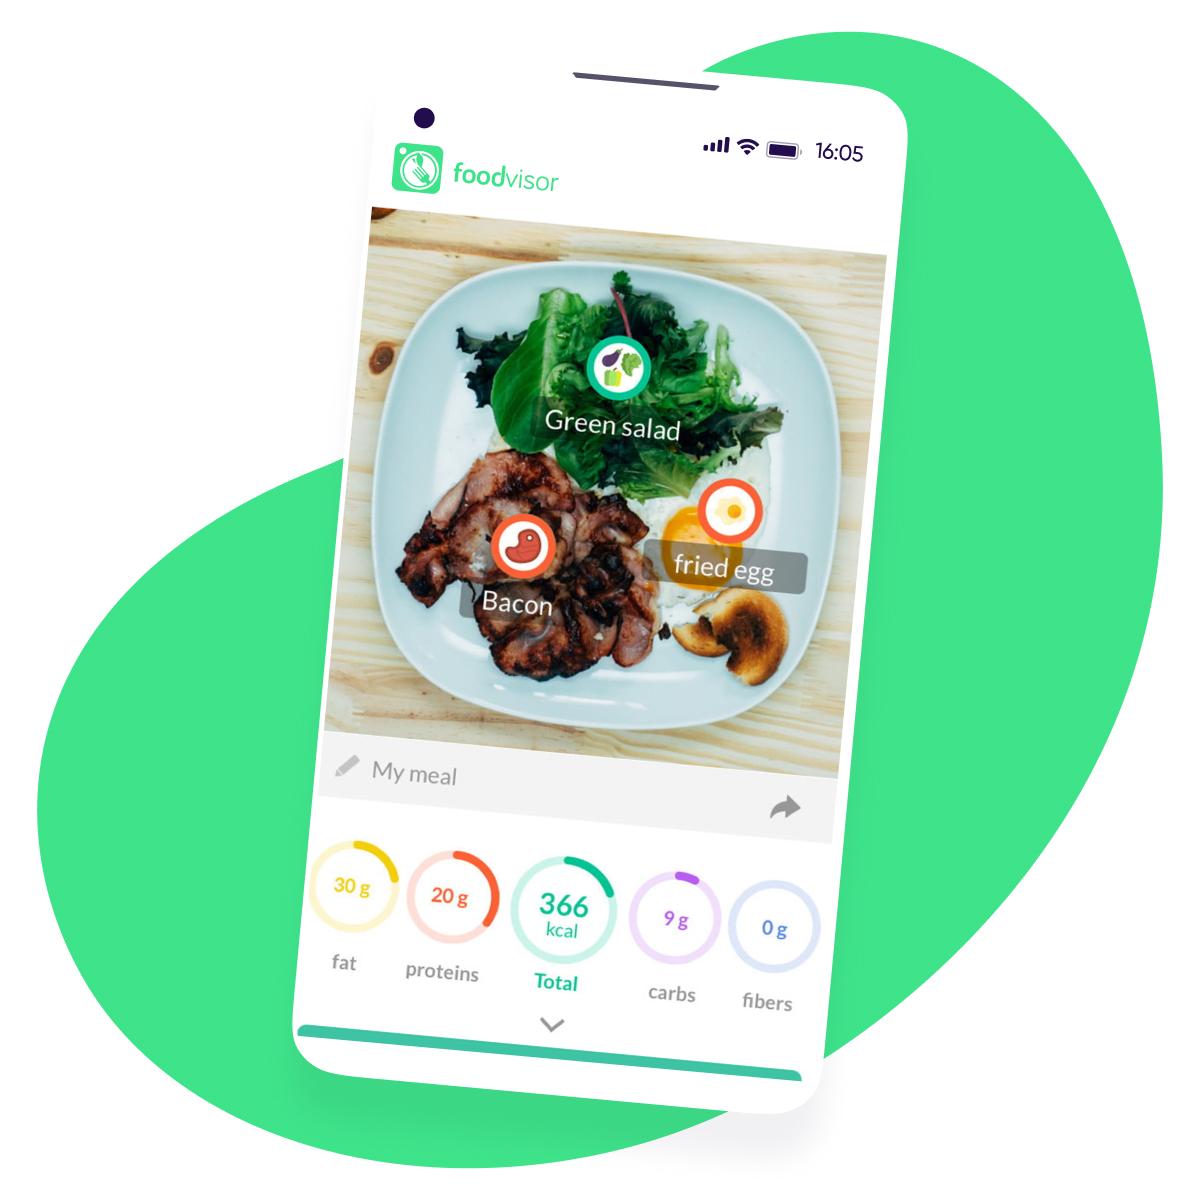 foodvisor success story - Square